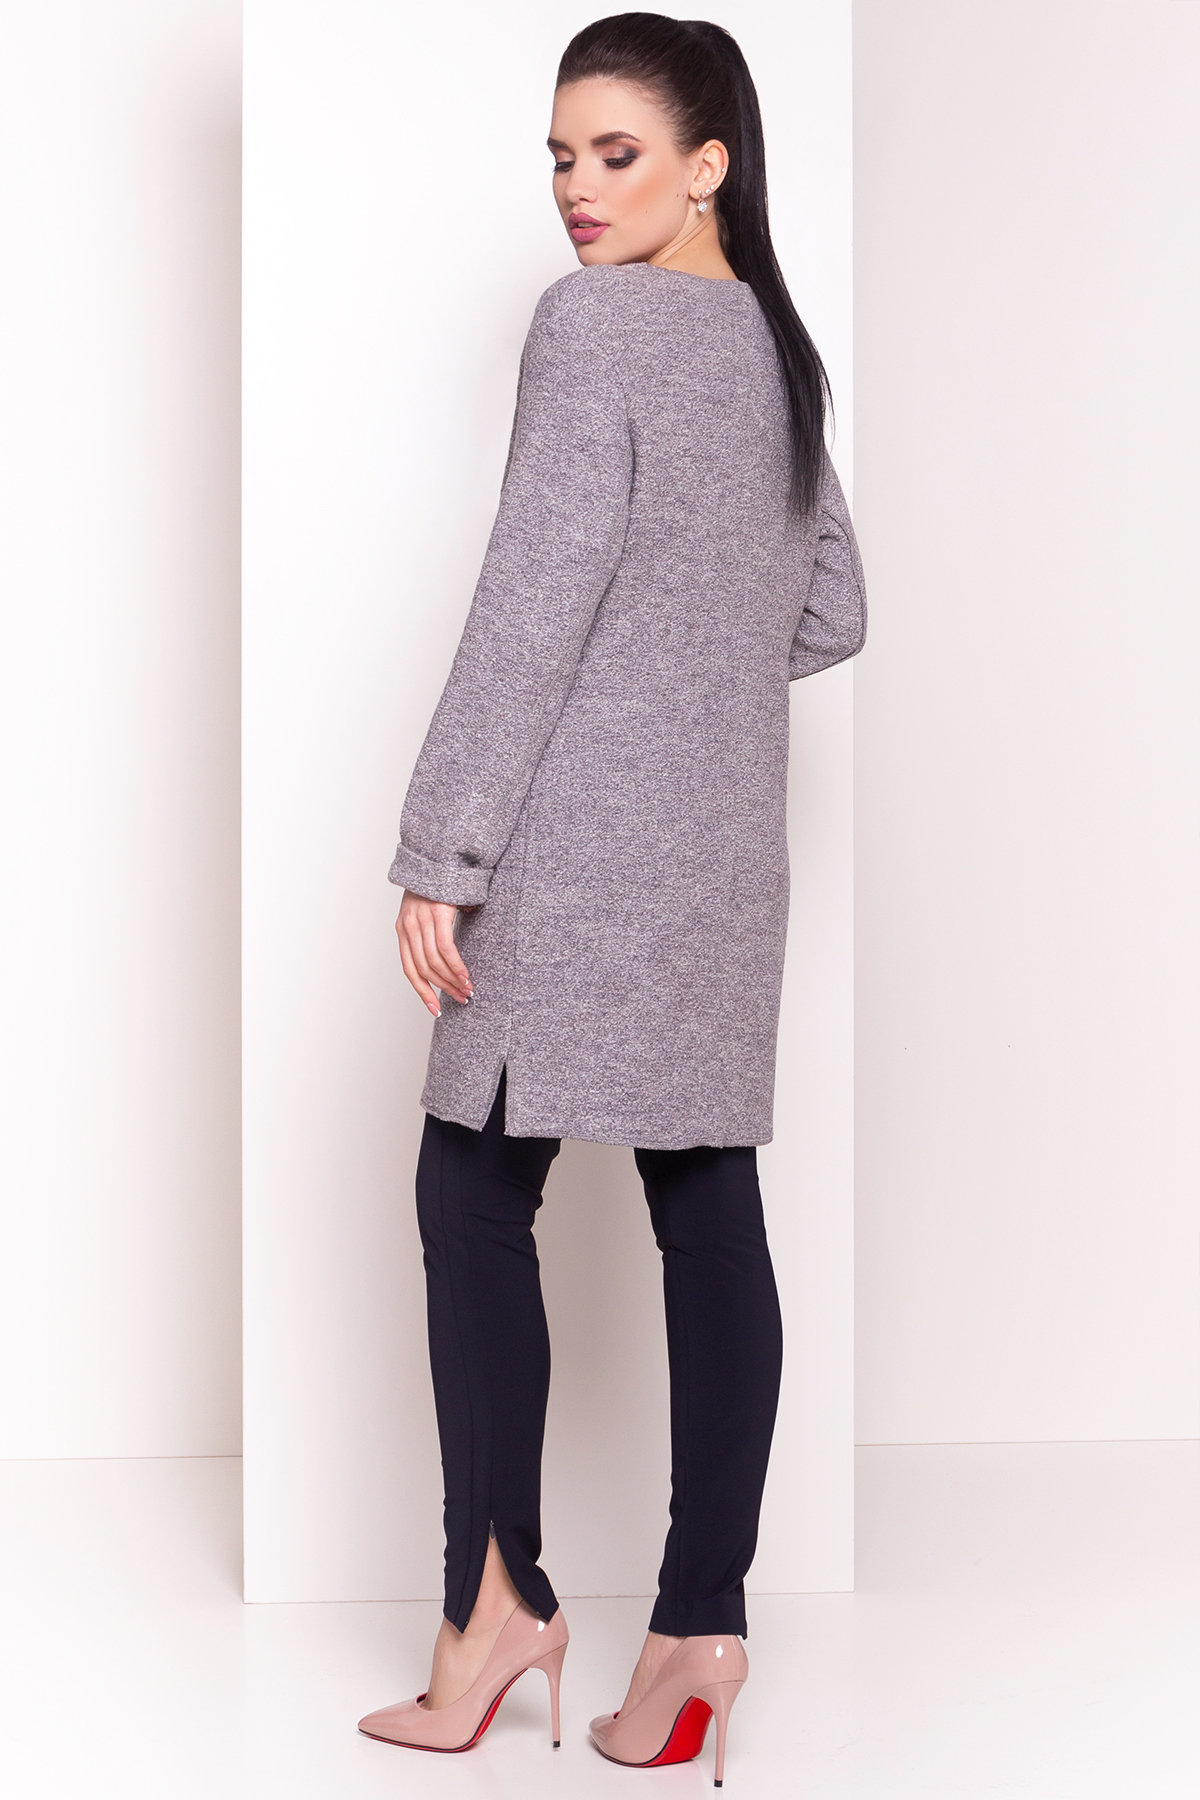 Кардиган с накладными карманами Нуар 4731 Цвет: Серый Светлый LW-10